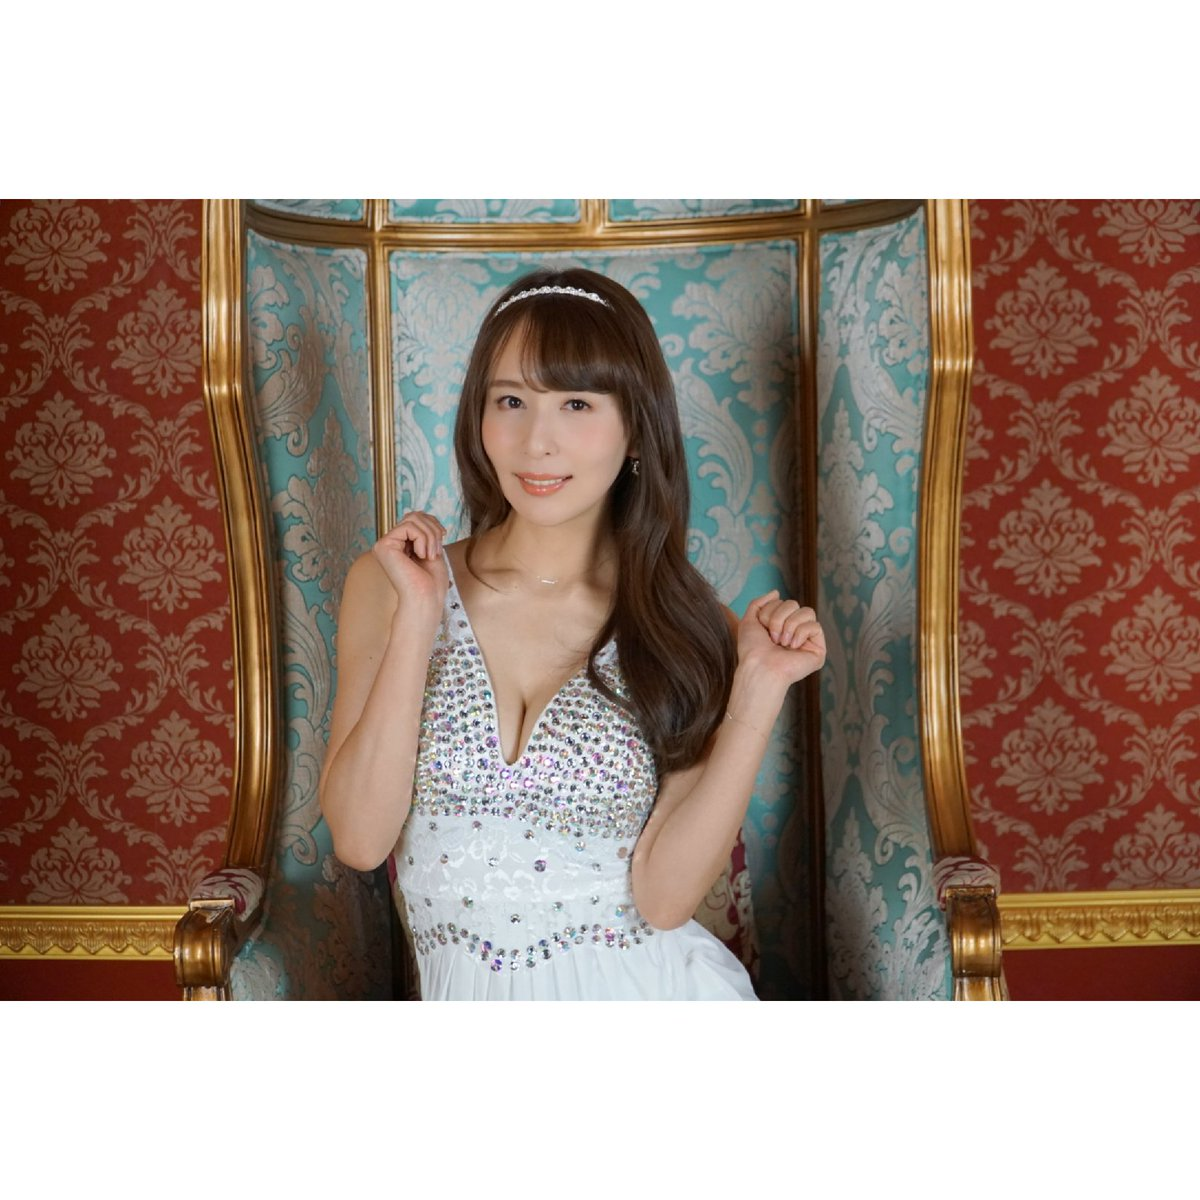 [DGC] No.1141 Jessica Kizaki 希崎ジェシカ2   Free hot girl pics